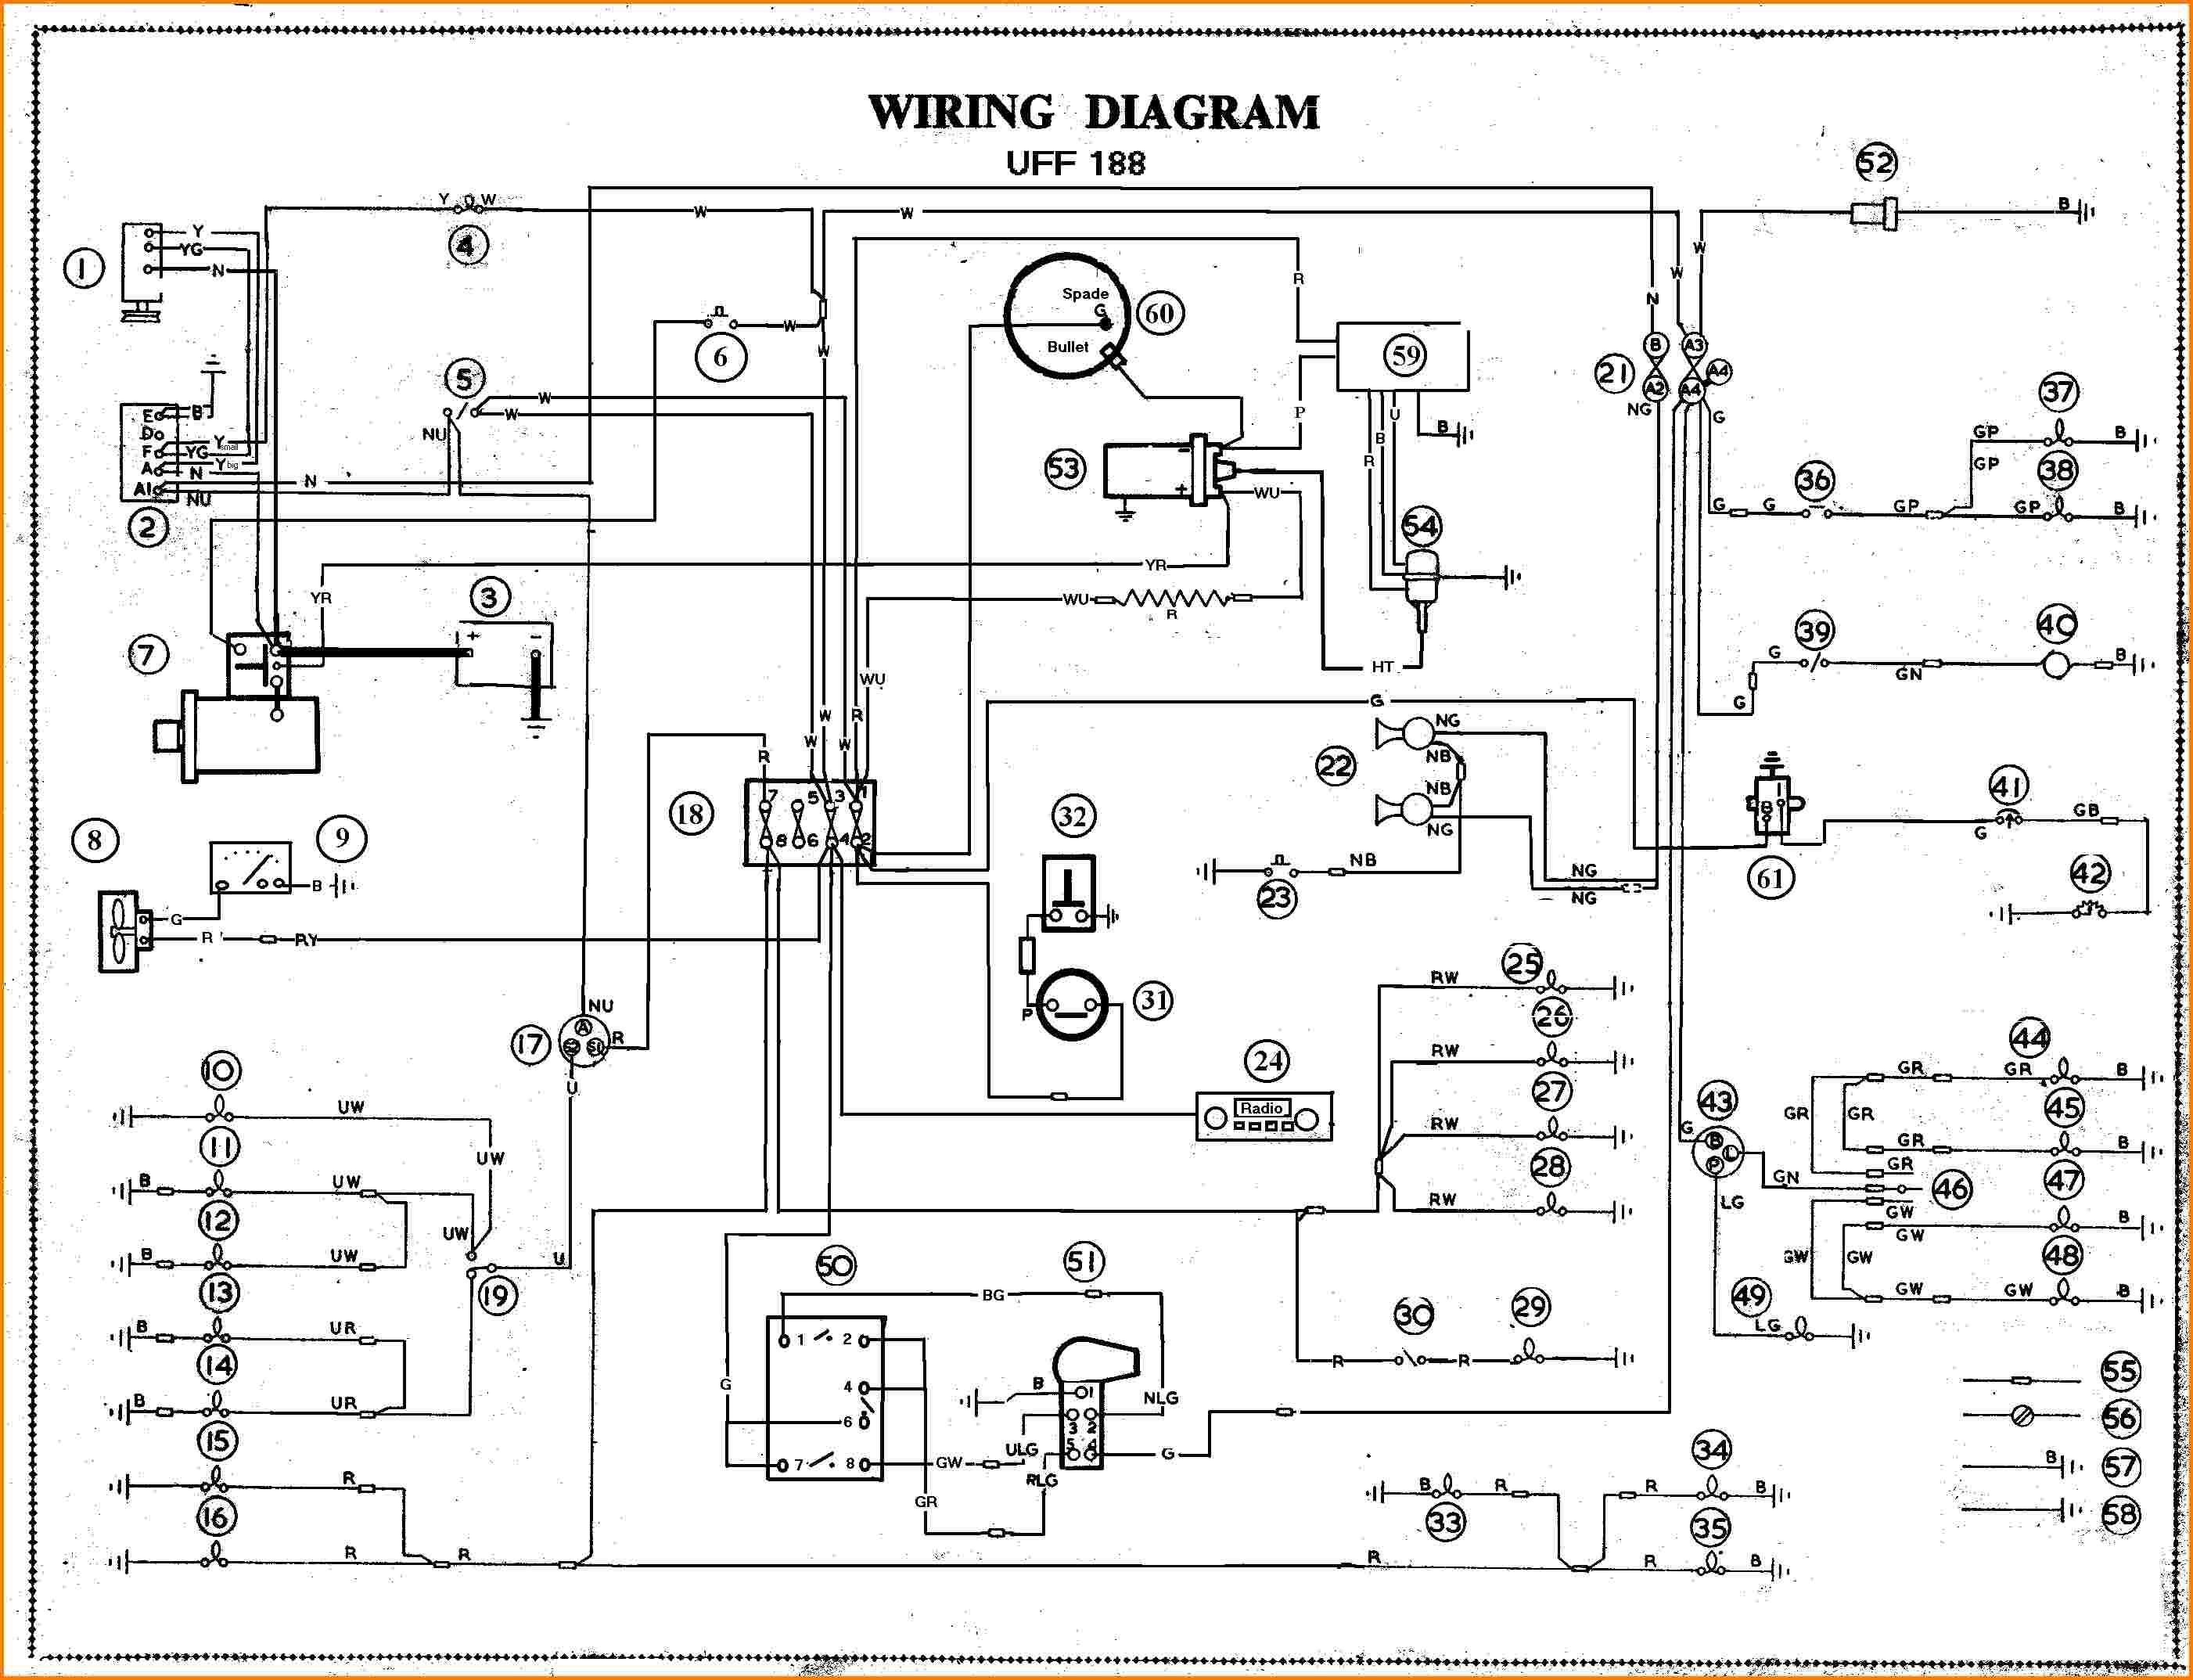 Wiring Schematics For Cars - Wiring Diagram Data - Club Car Wiring Diagram